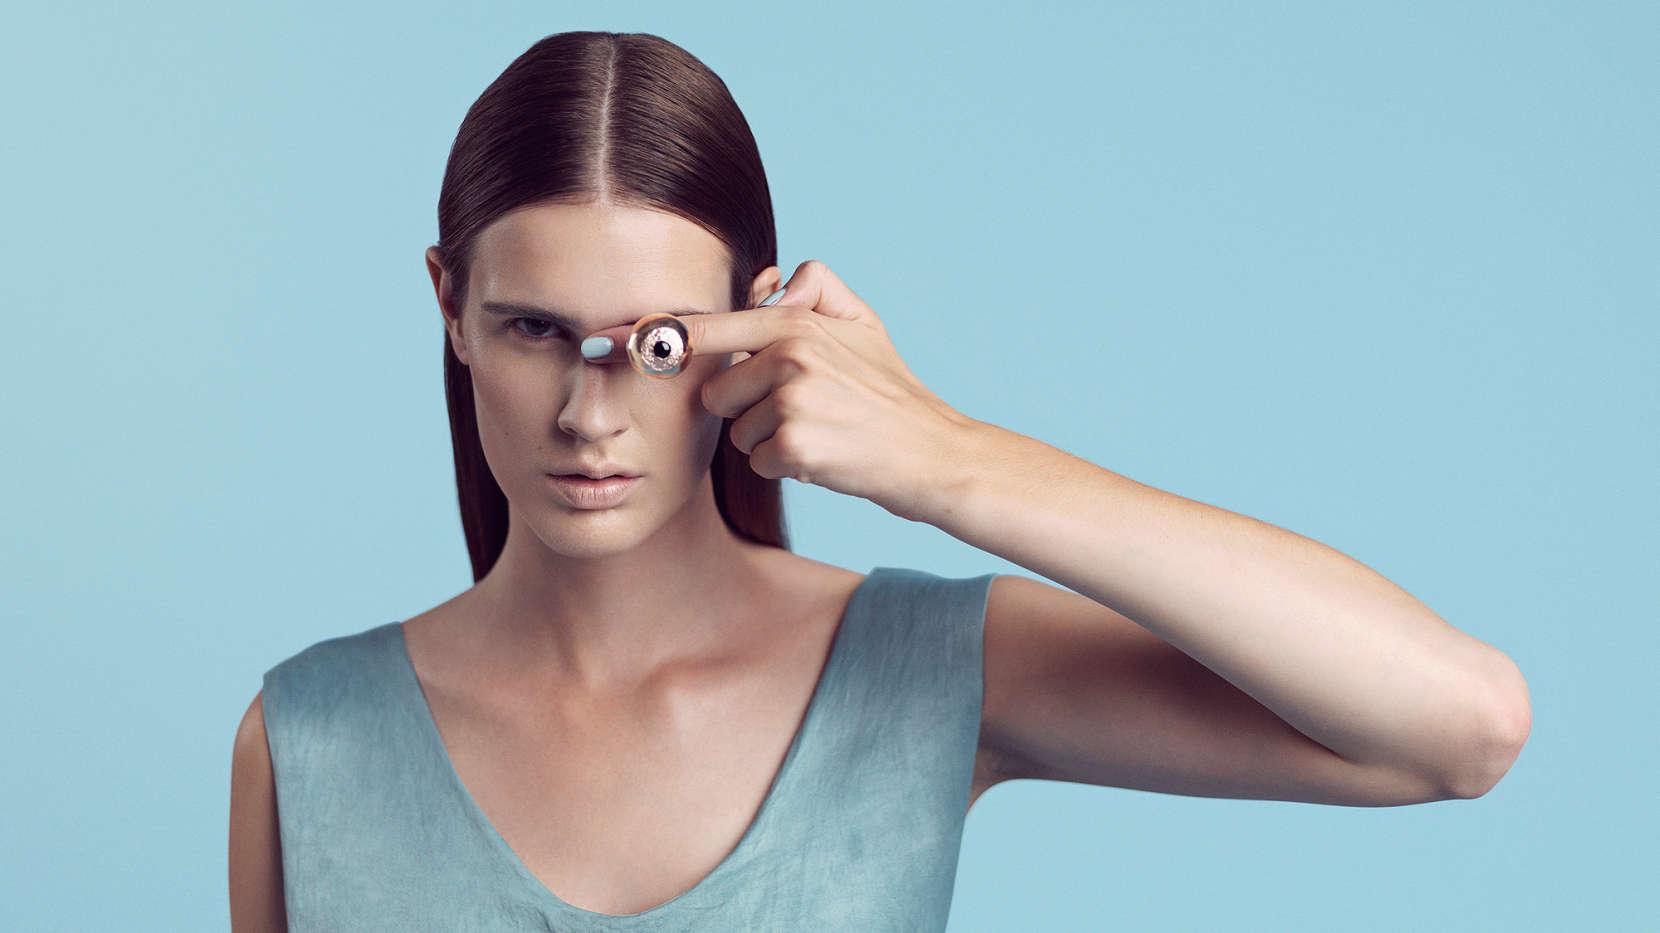 Designer-to-watch_BJORG_the-observer-ring-1660x933.jpg